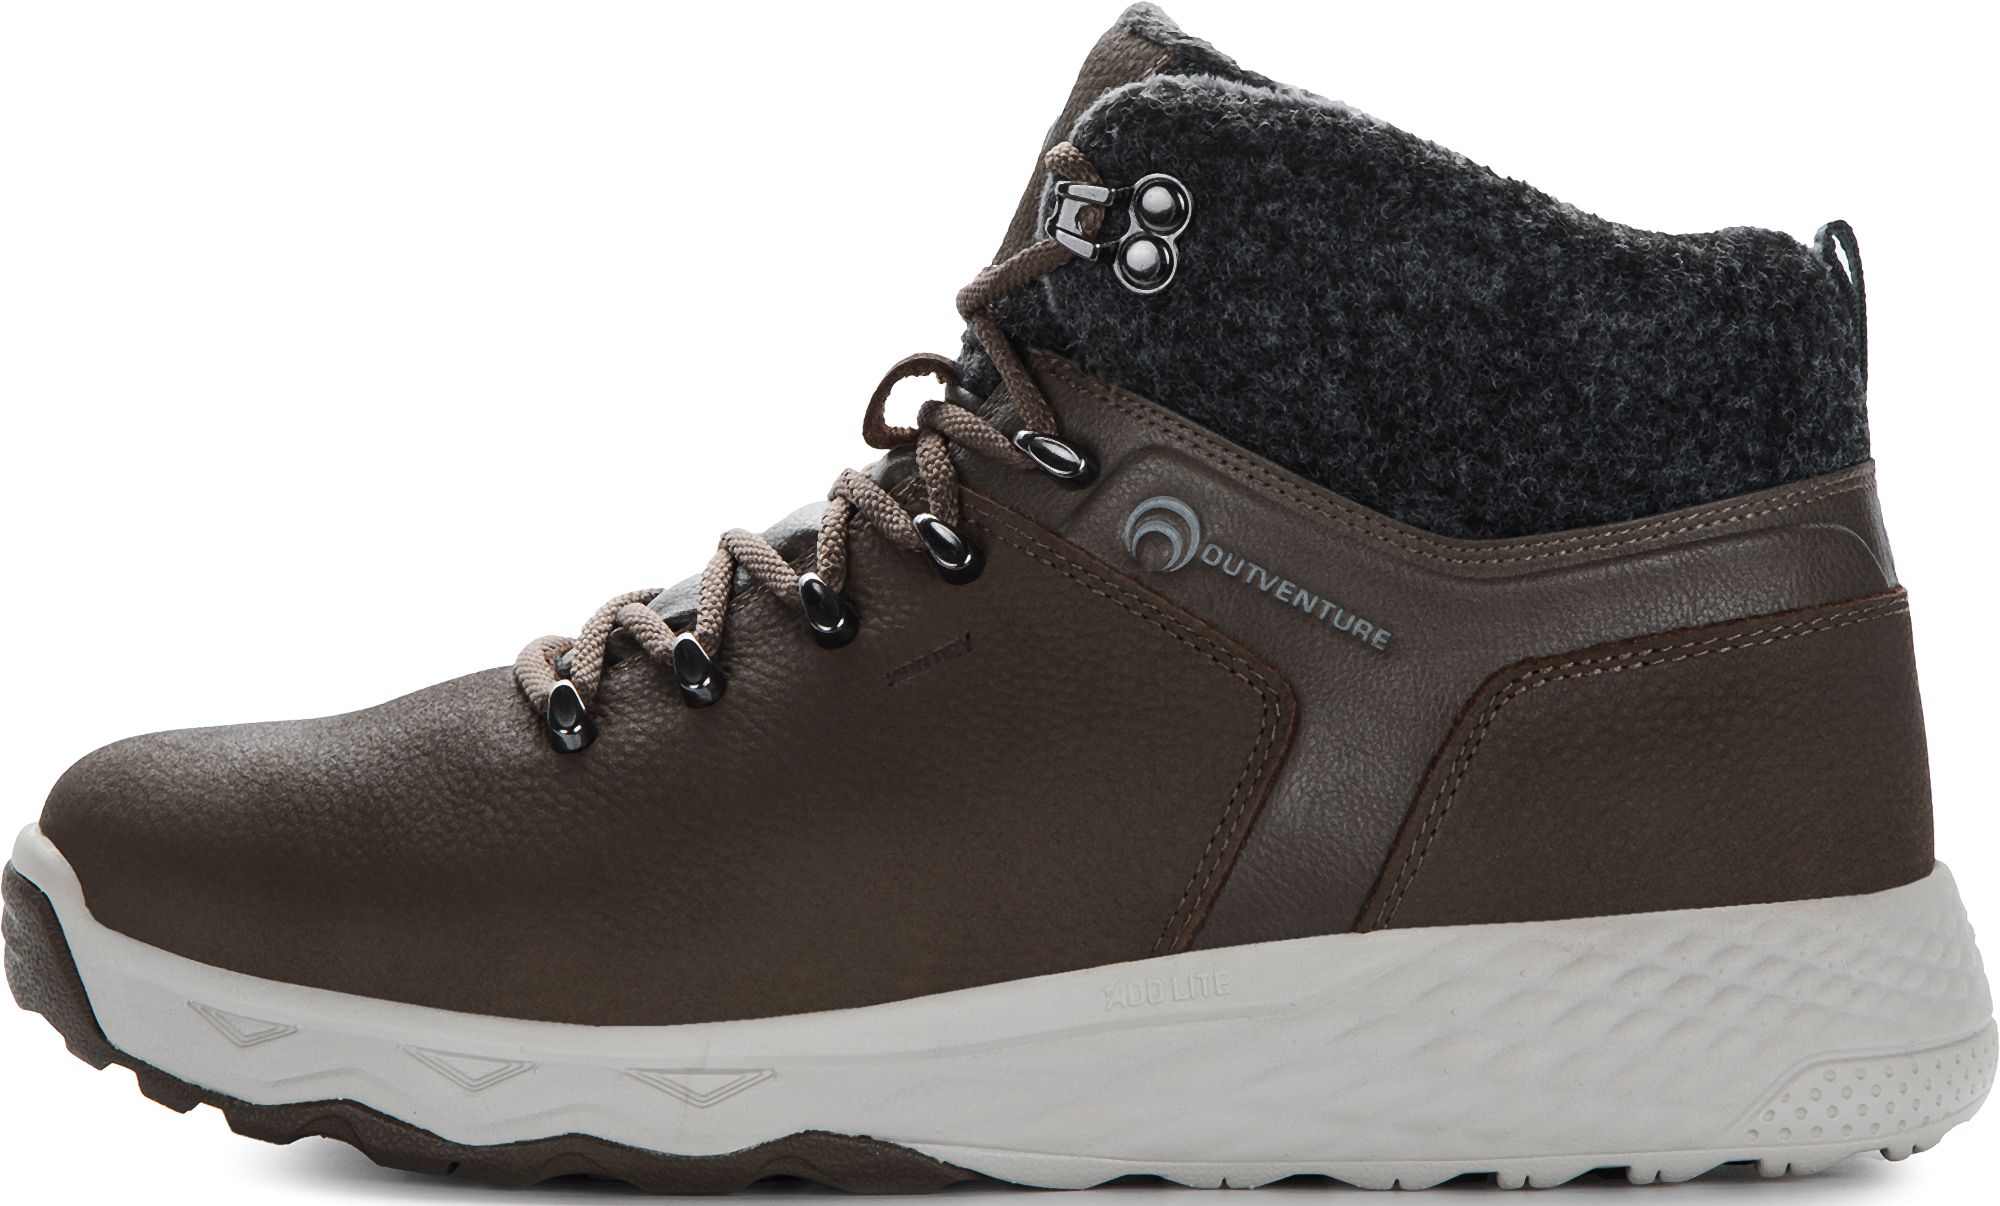 Outventure Ботинки утепленные мужские Pilgrim, размер 40